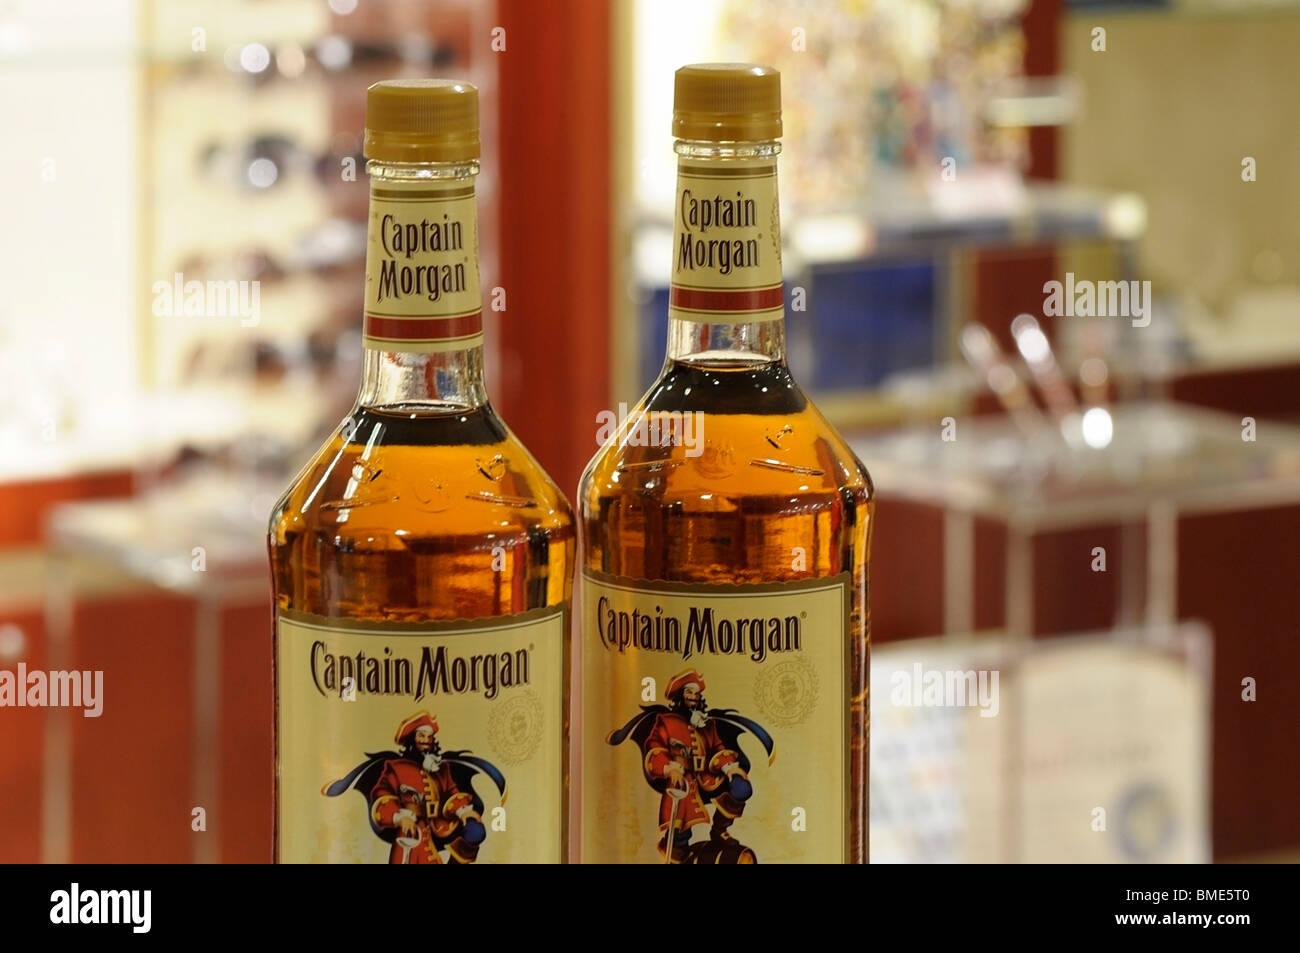 Bottles of Rum - Stock Image